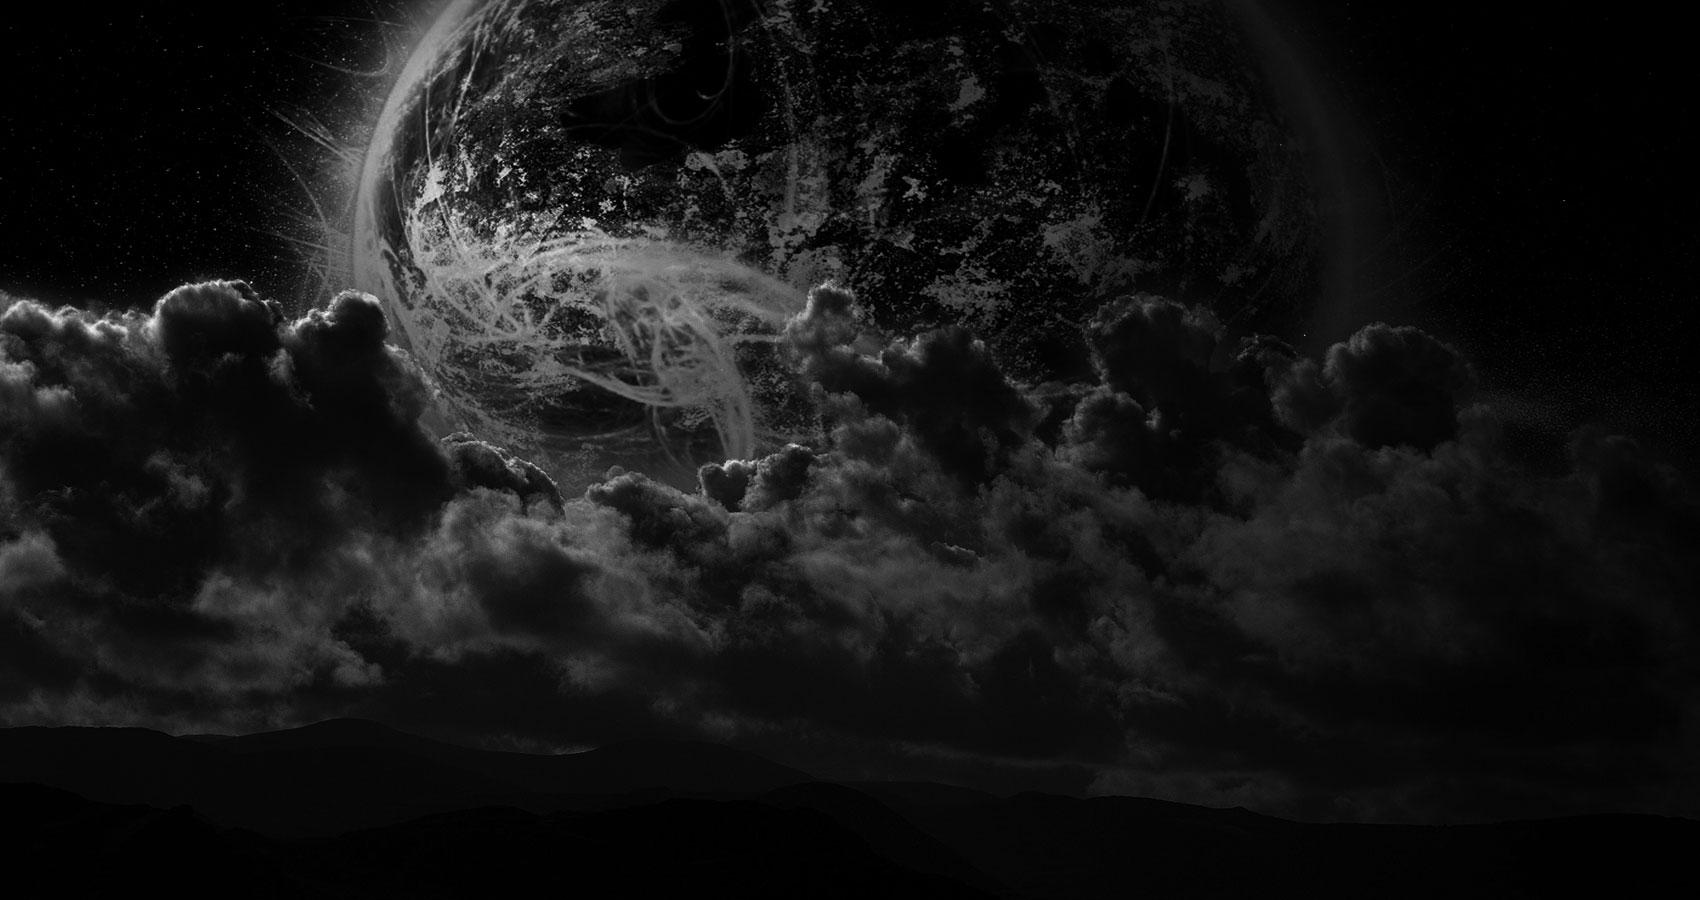 Darkness Falls written by Odonko-ba at Spillword.com